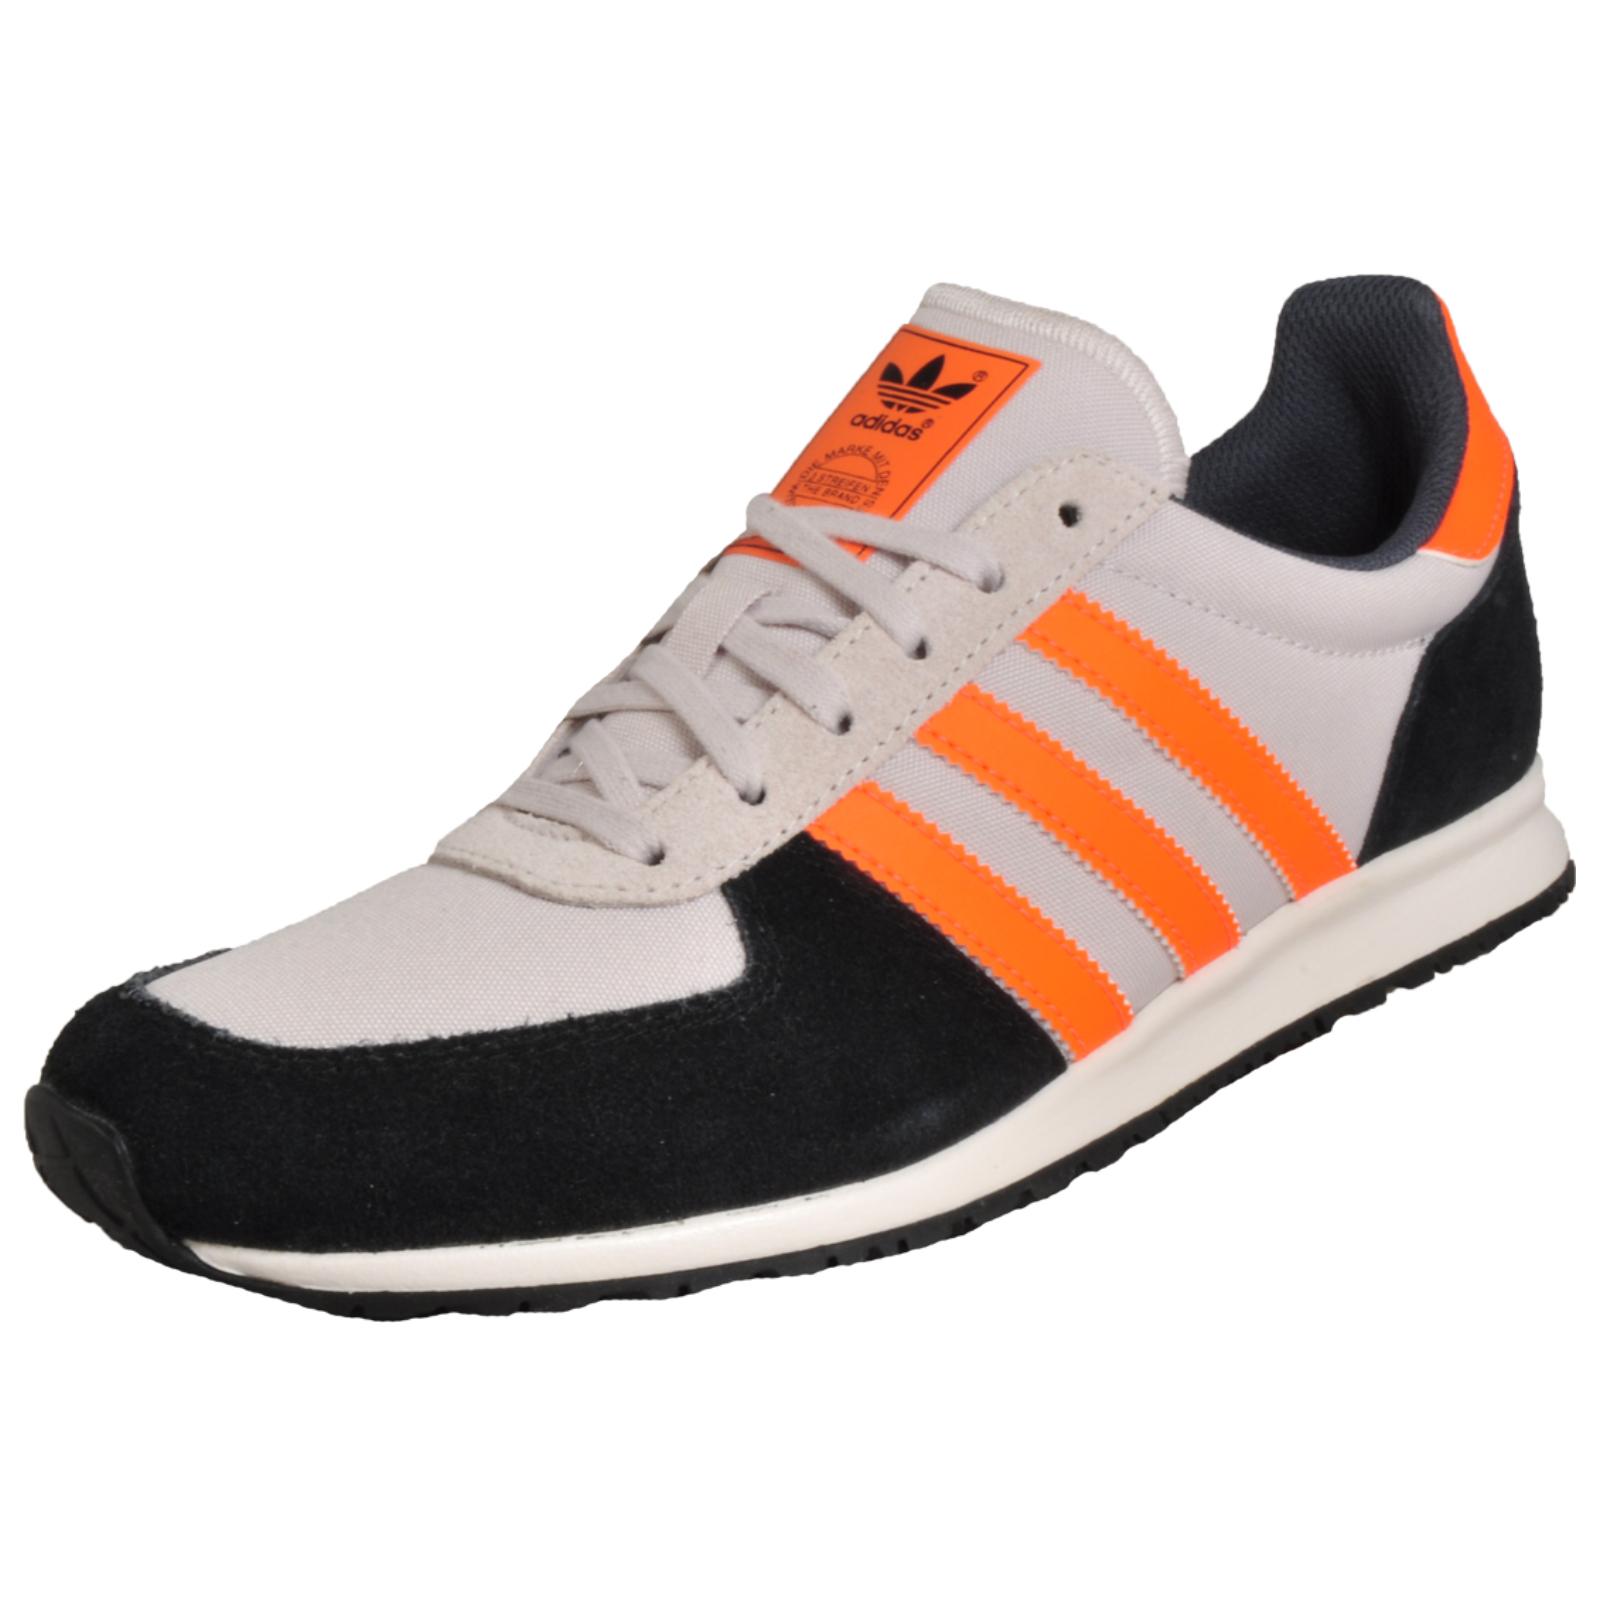 brand new 6fb1f 8cd34 Adidas Originals Adistar Racer Classic Casual Retro Trainers Sneakers